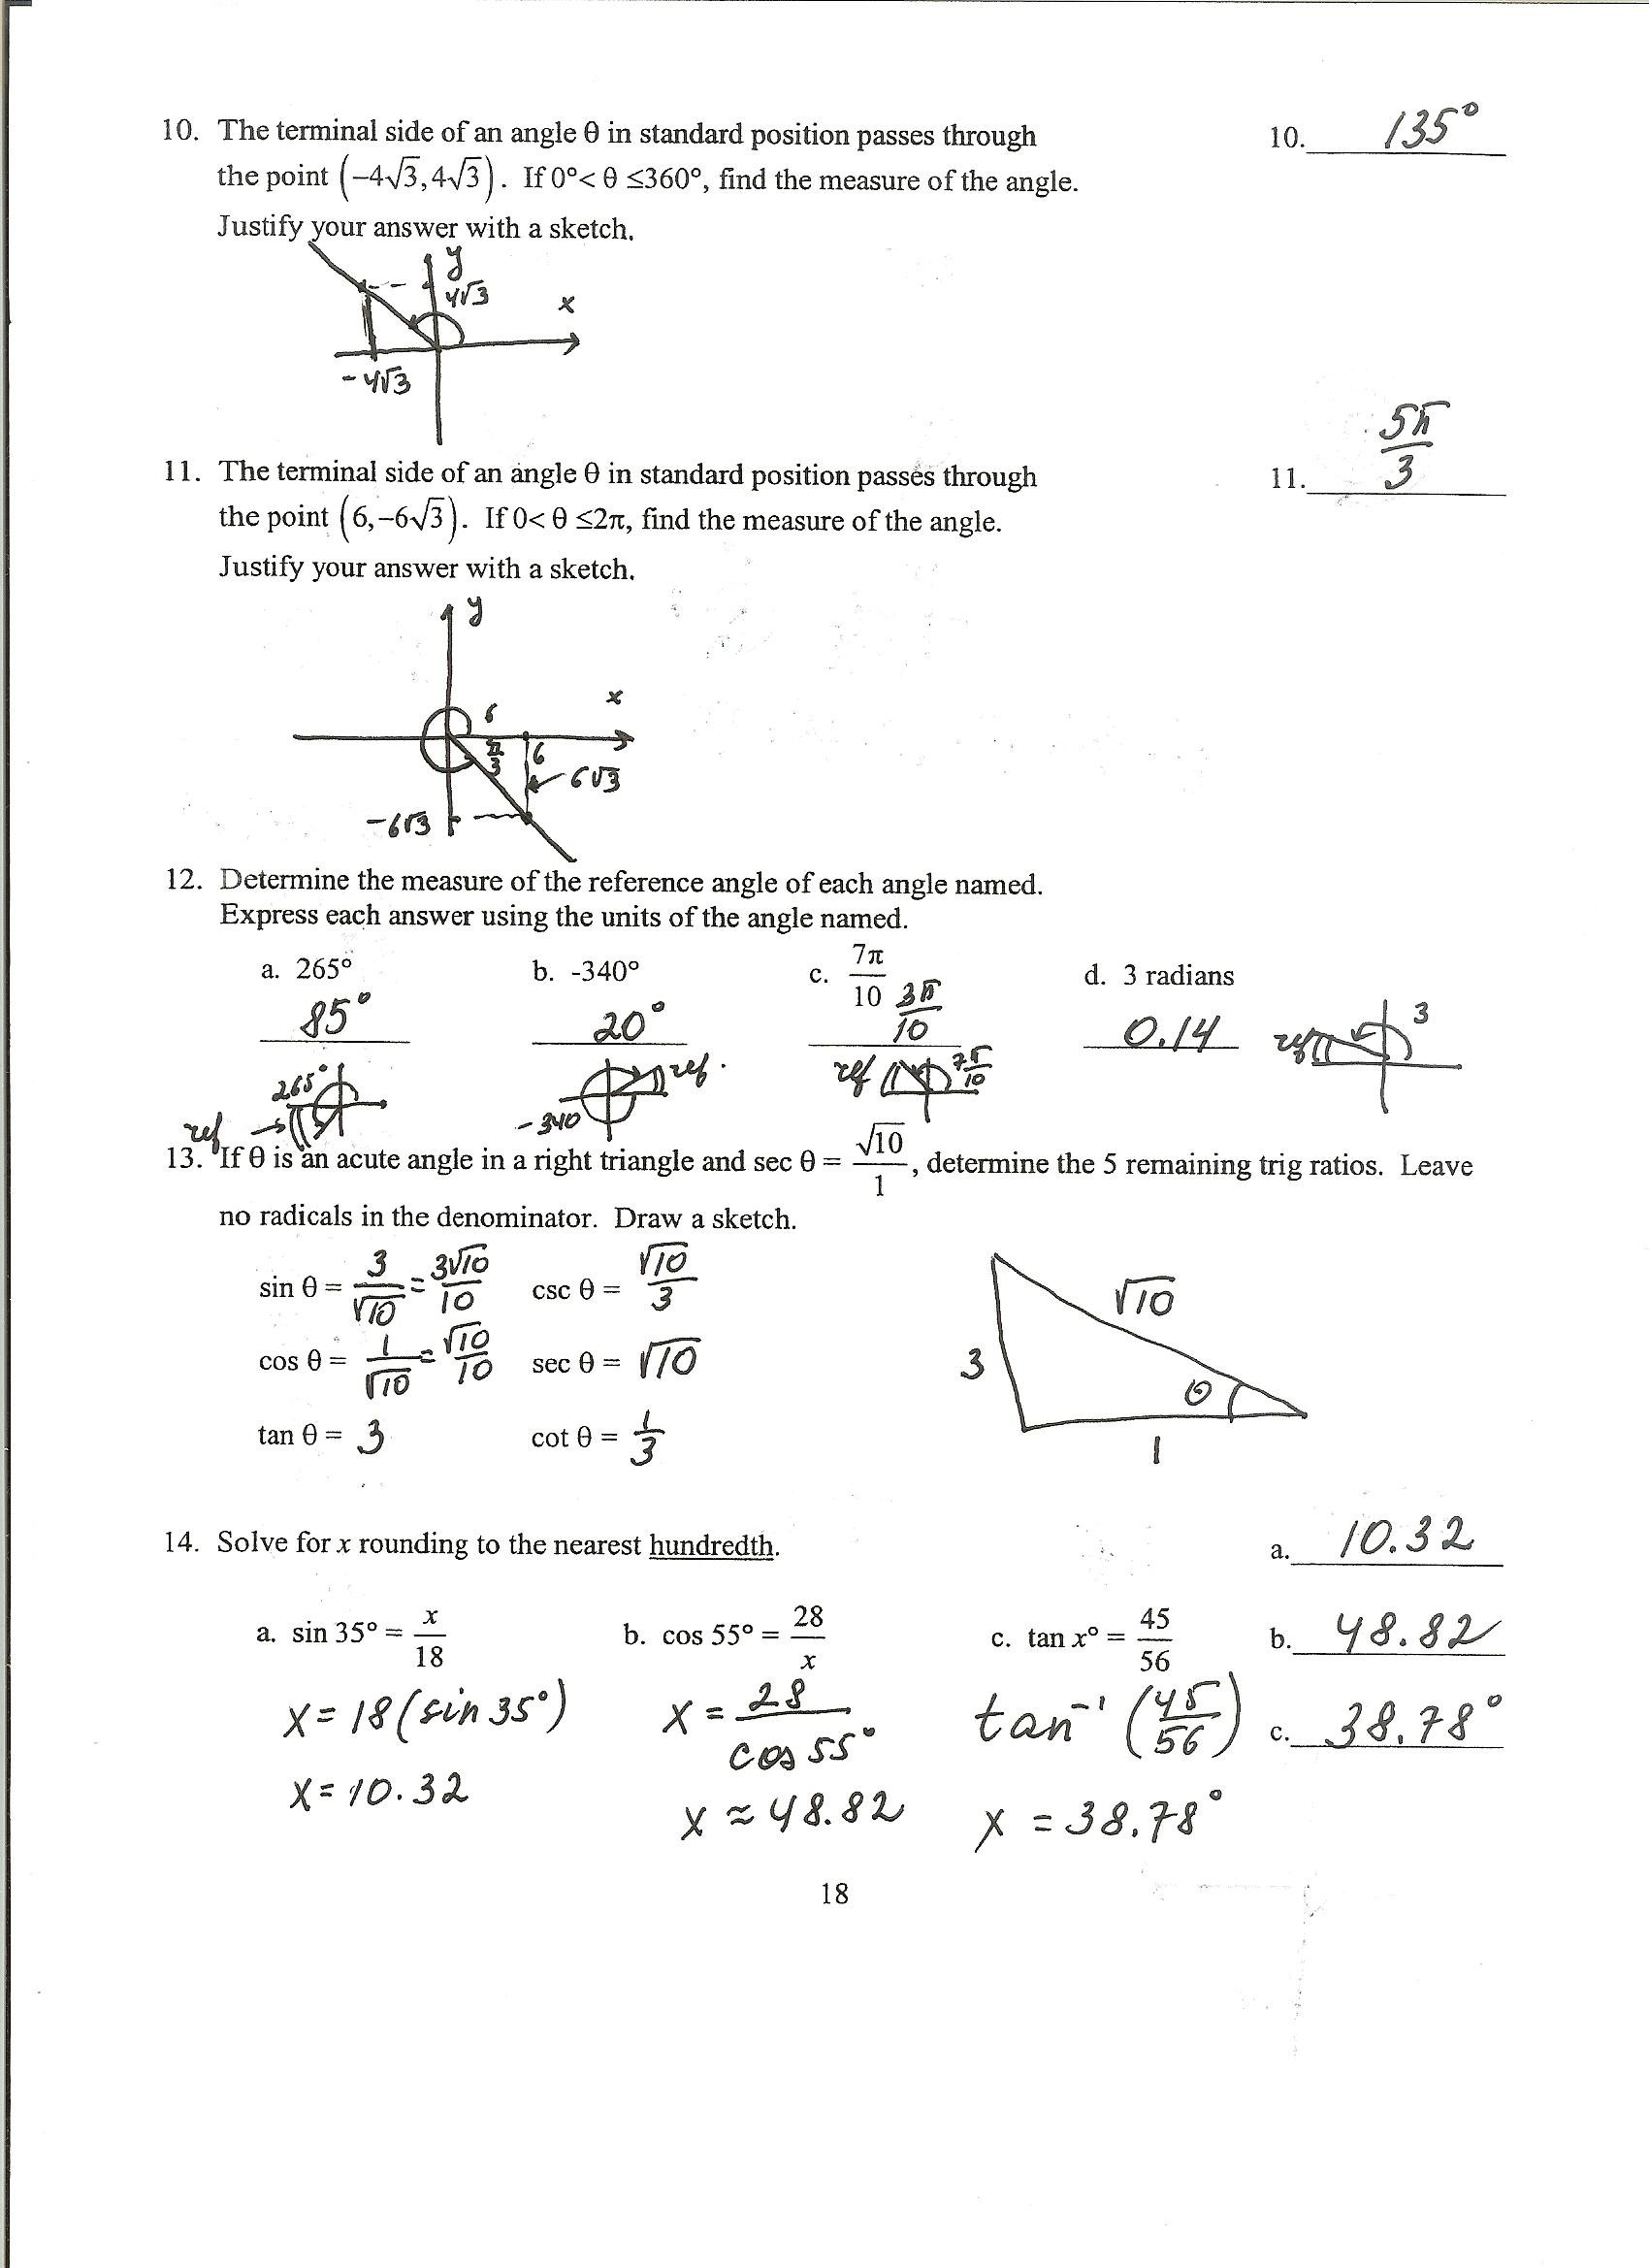 Worksheet With Answers On Trigonometric Identities